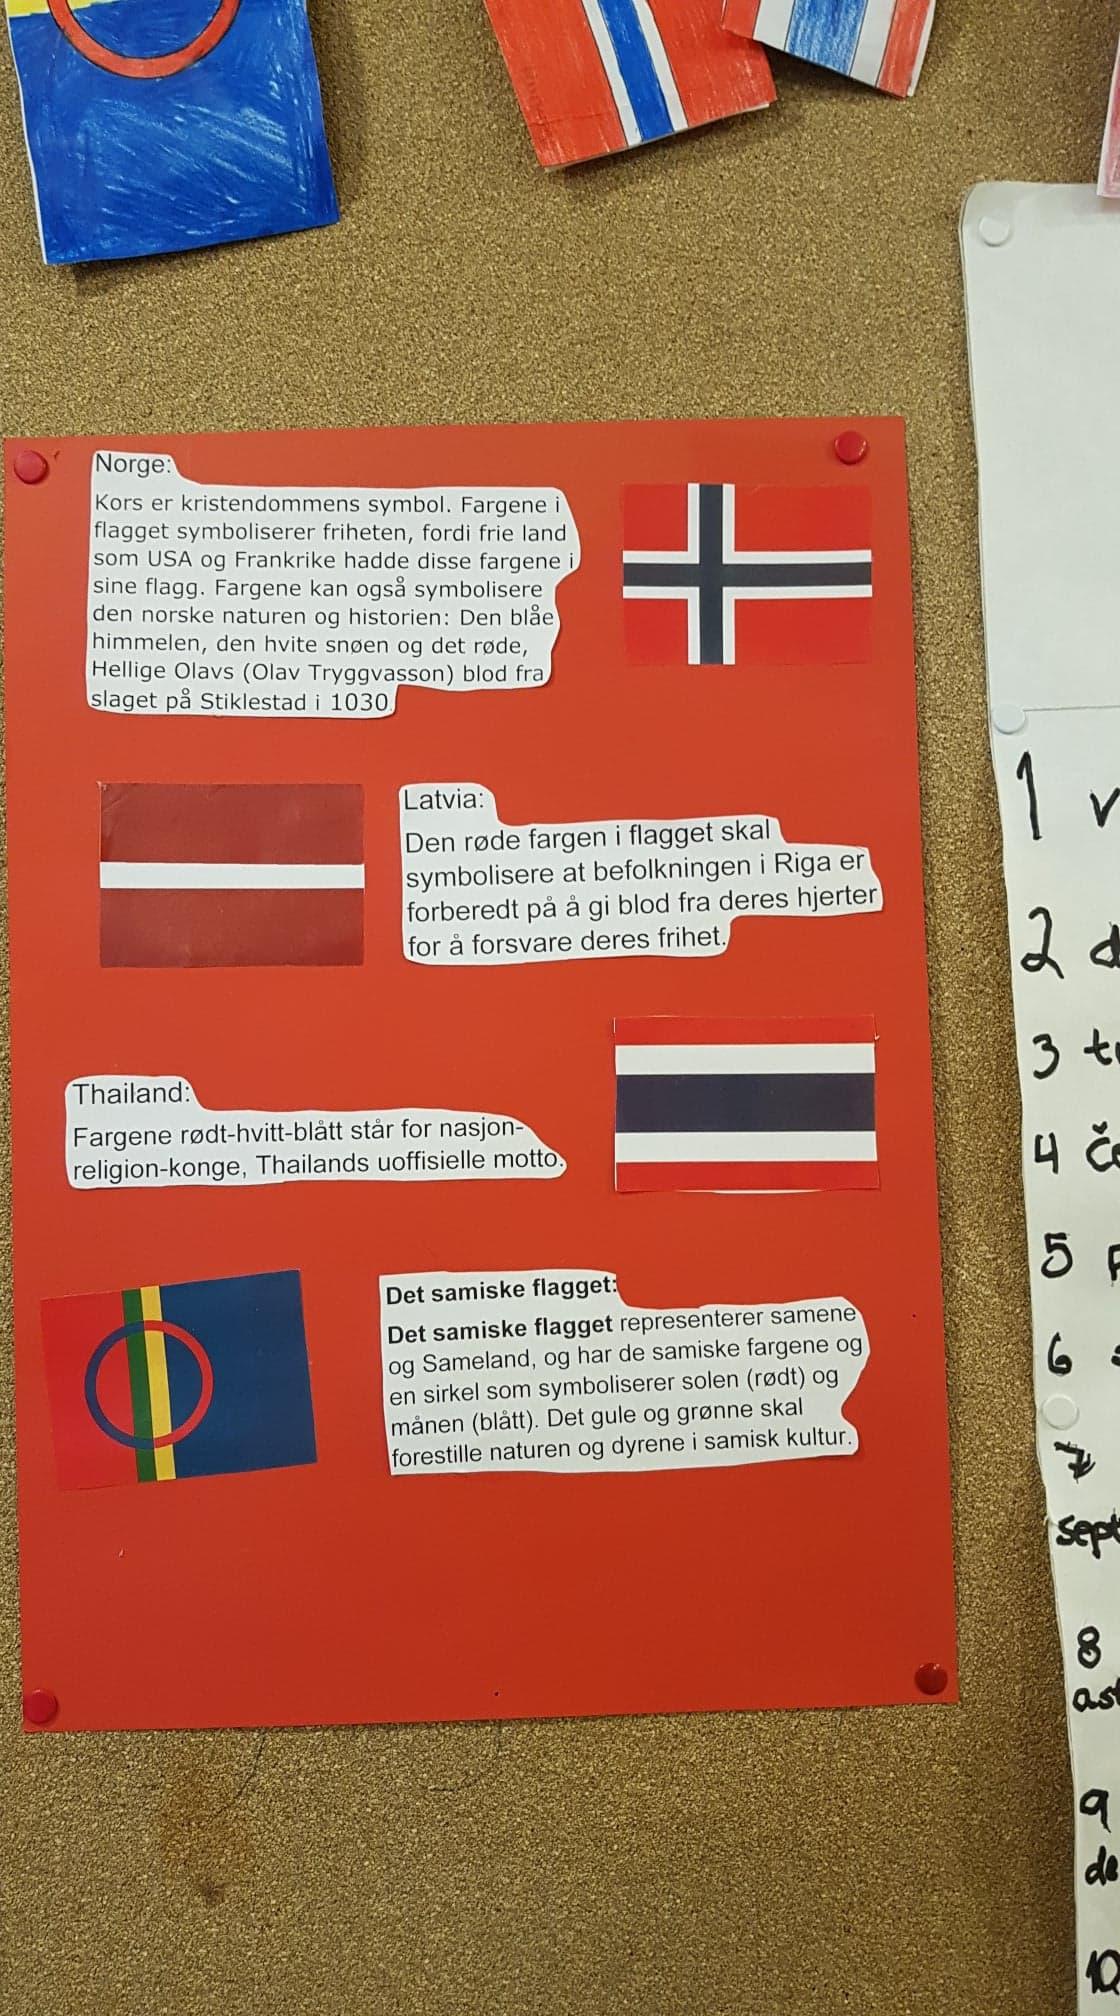 Flaggene symboliserer